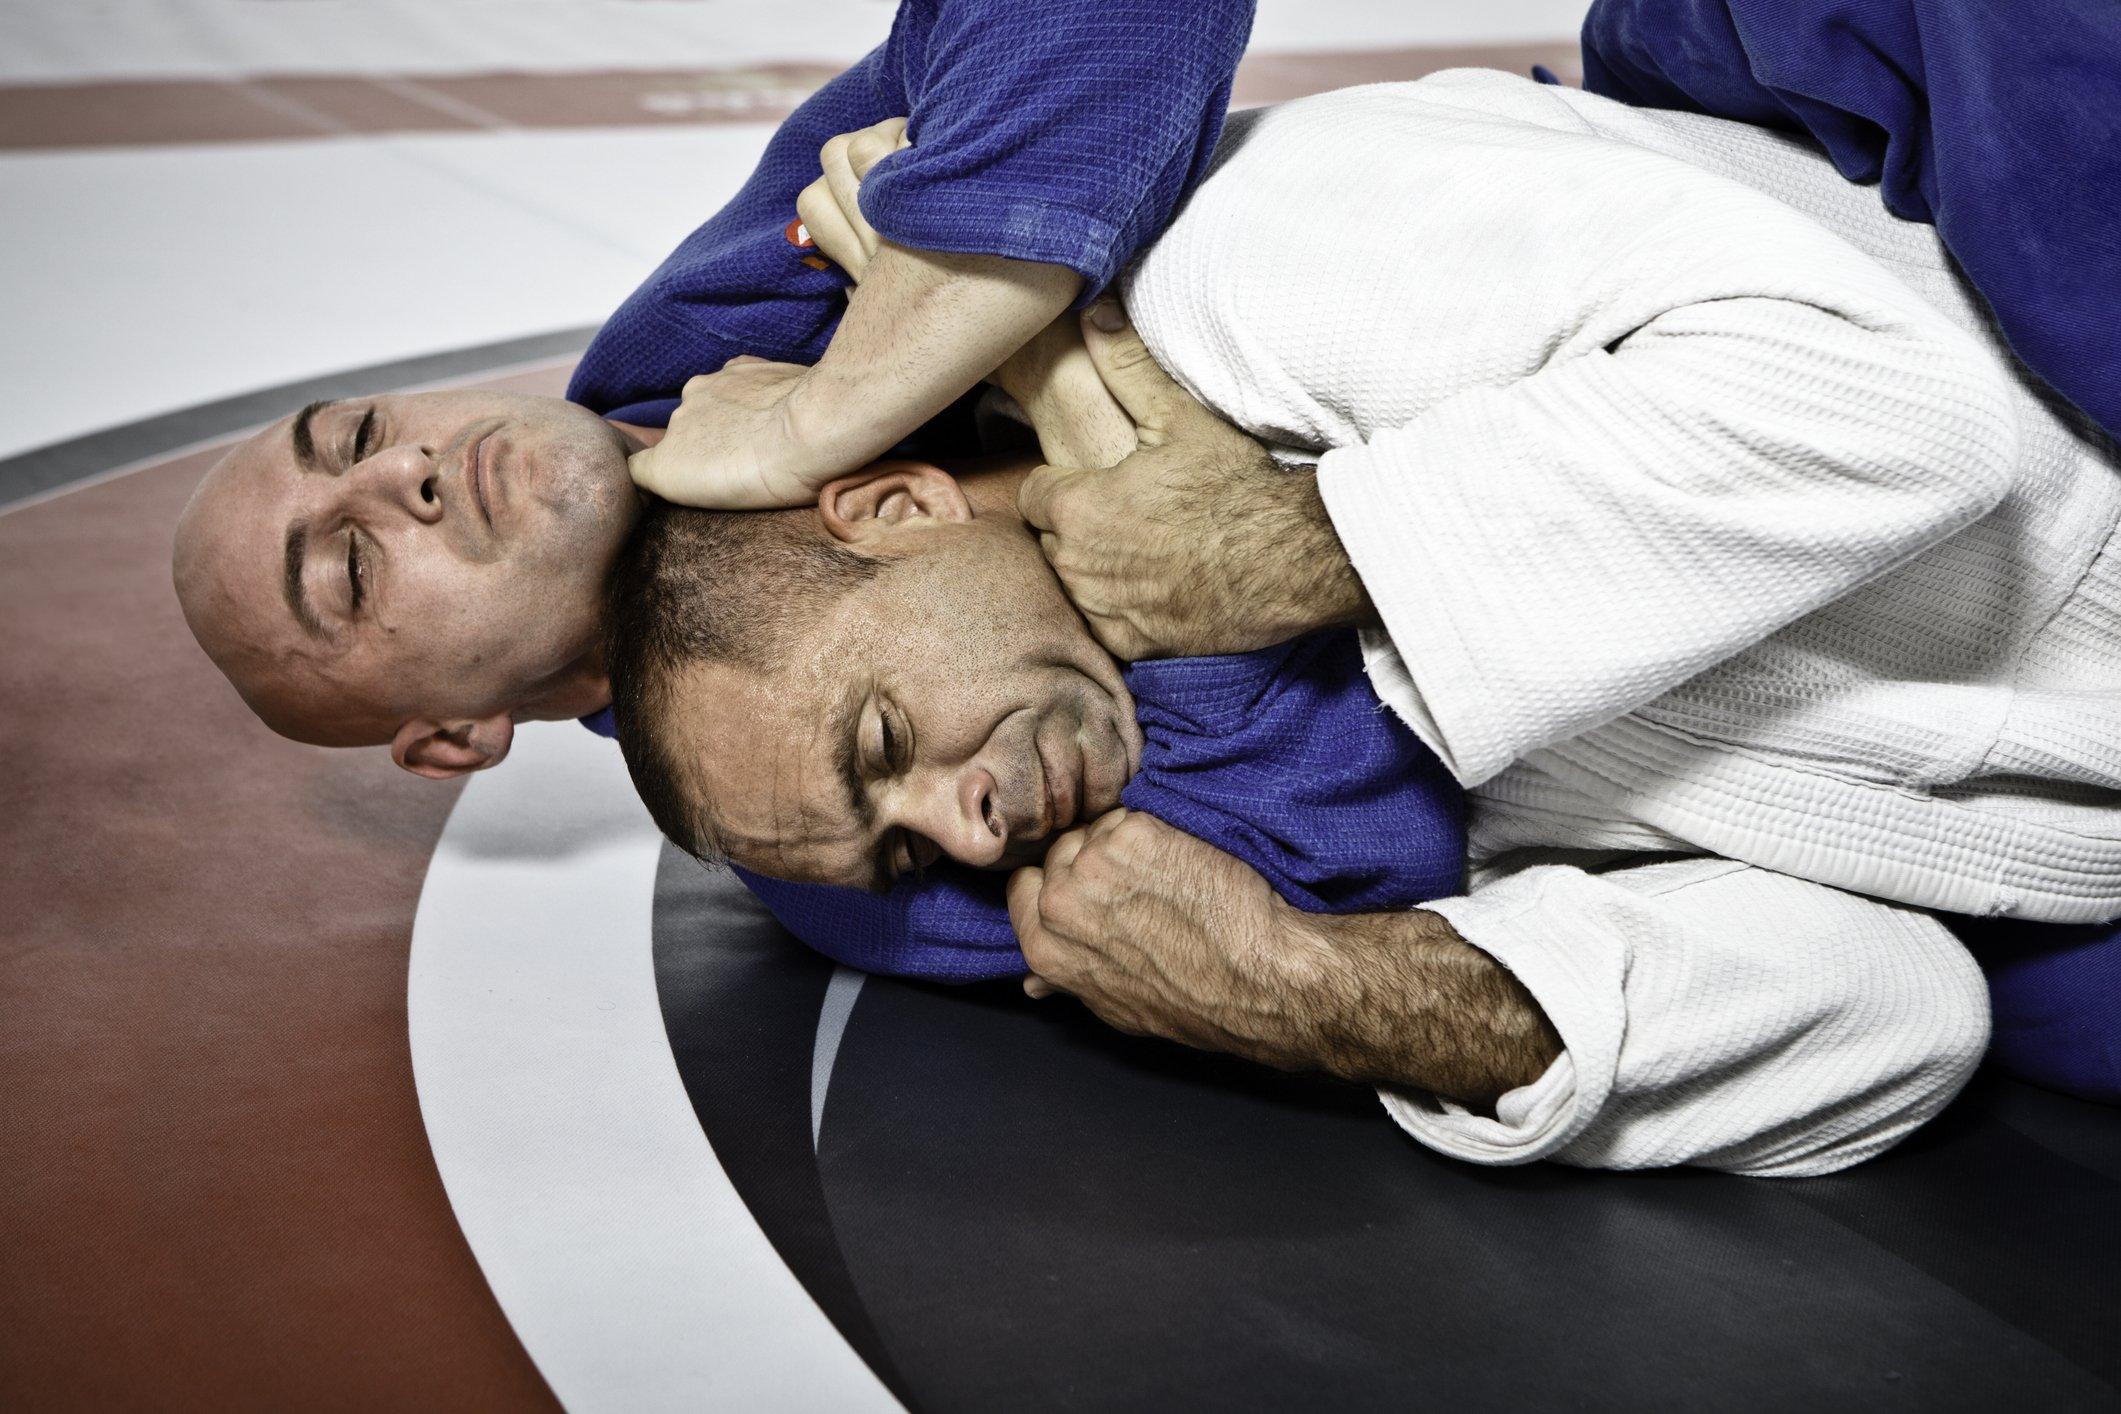 brazilian jiu jitsu classes in massapequa park, ny